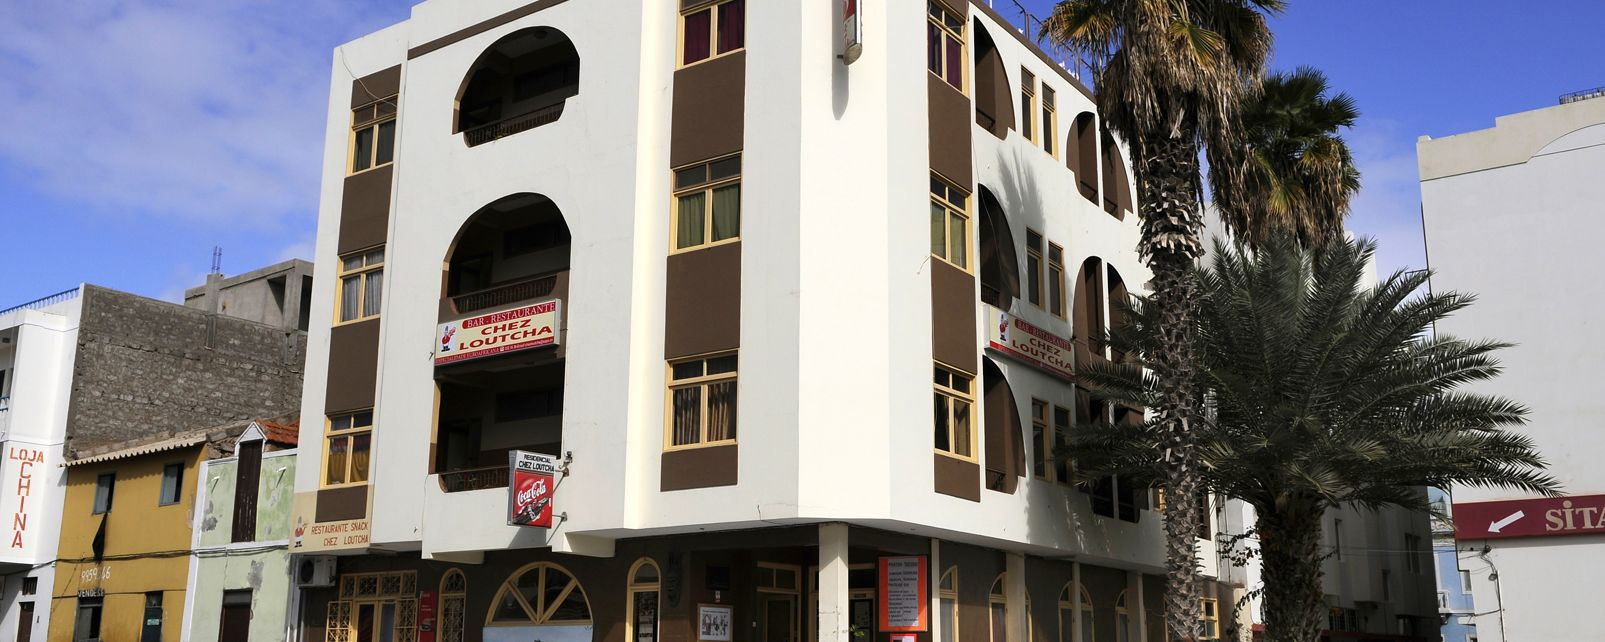 Hotel Chez Loutcha